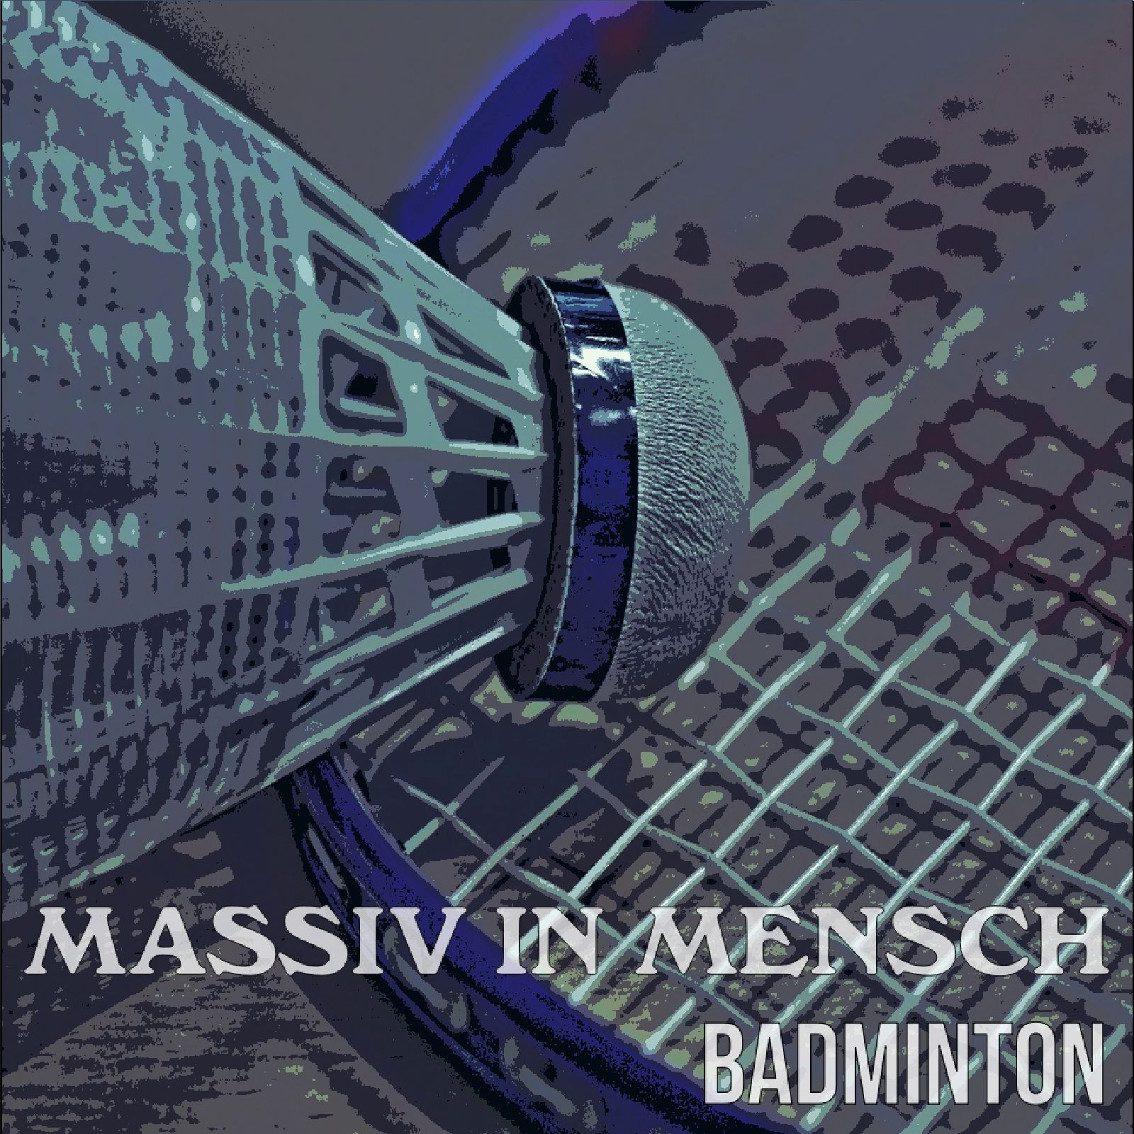 Massiv in Mensch return with 'Badminton' single on July 29